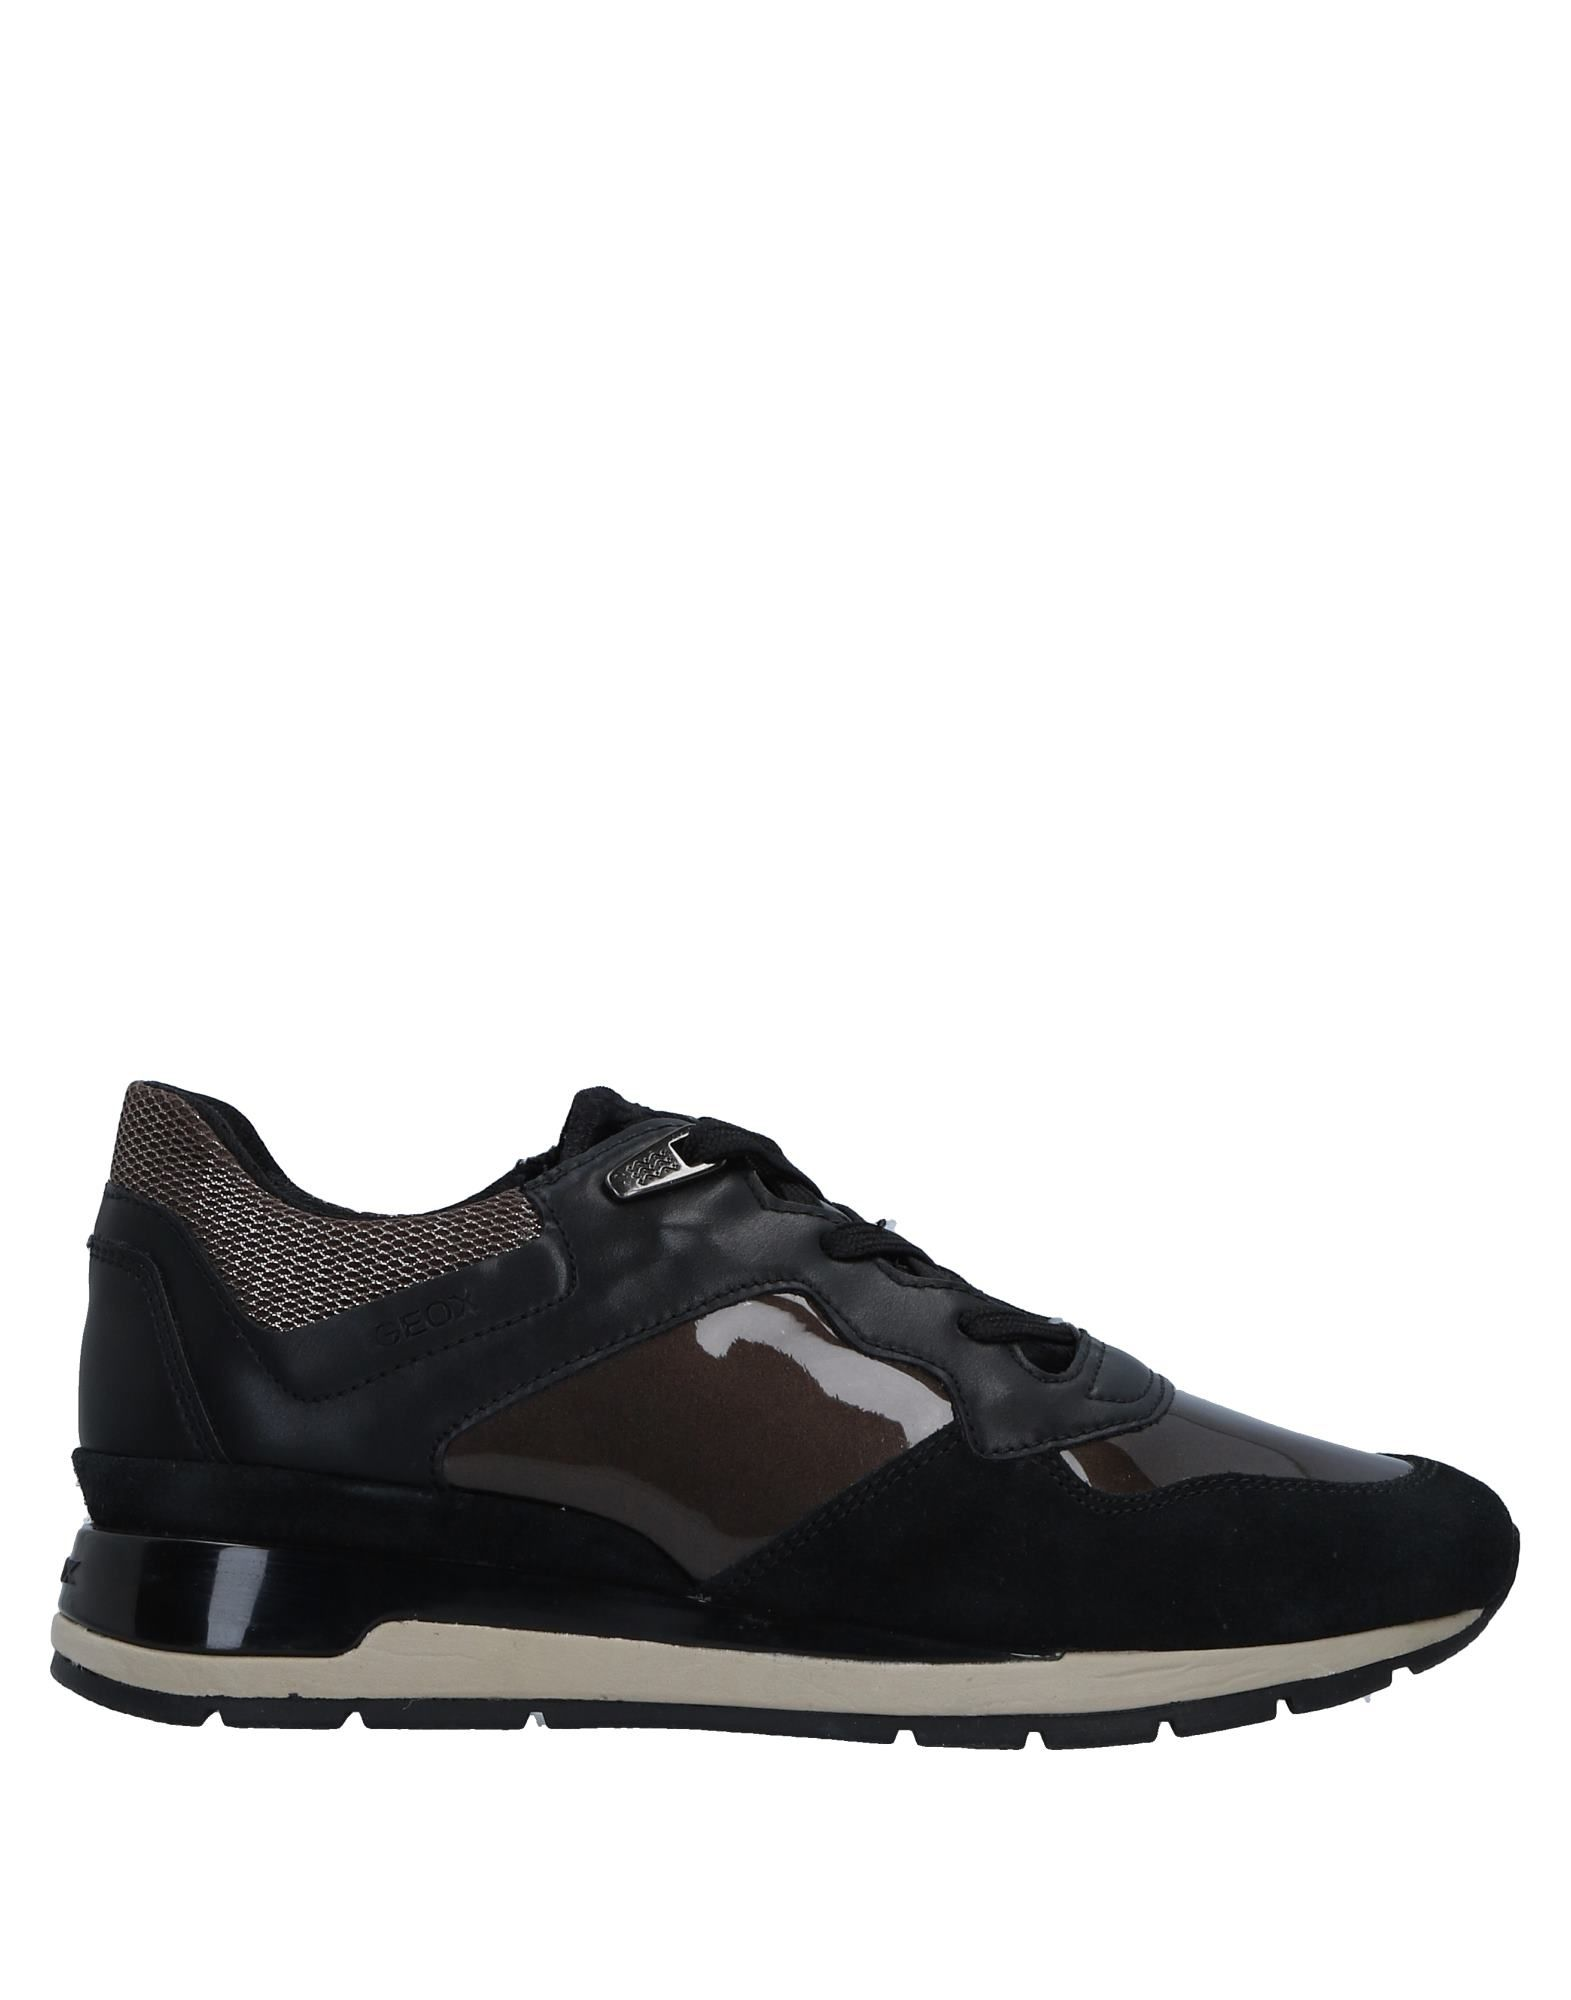 Geox Sneakers Damen  11541744EQ Gute Qualität beliebte Schuhe